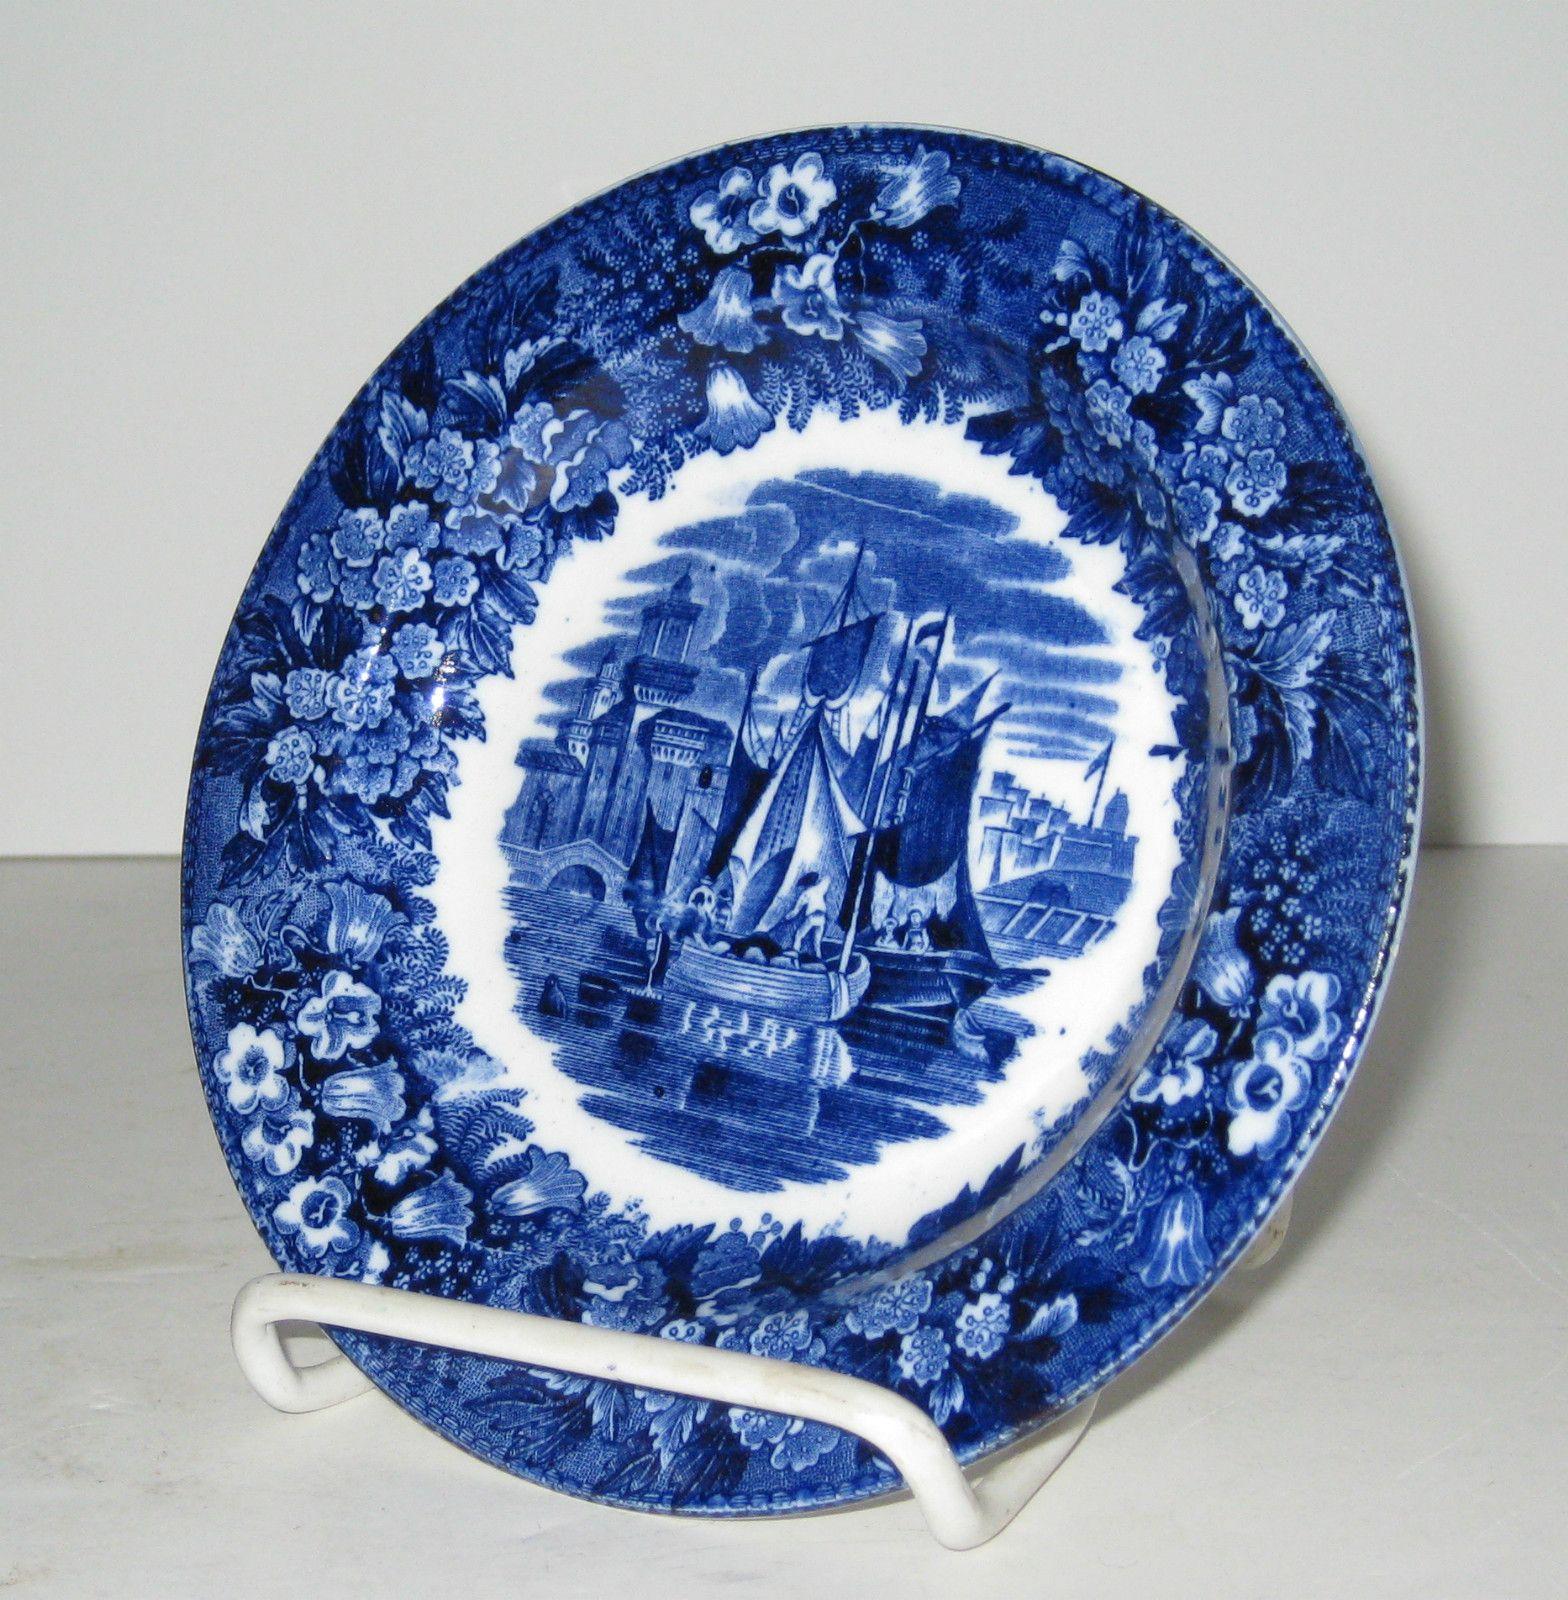 Wedgwood Etruria Ferrara Blue White Transferware Plate C